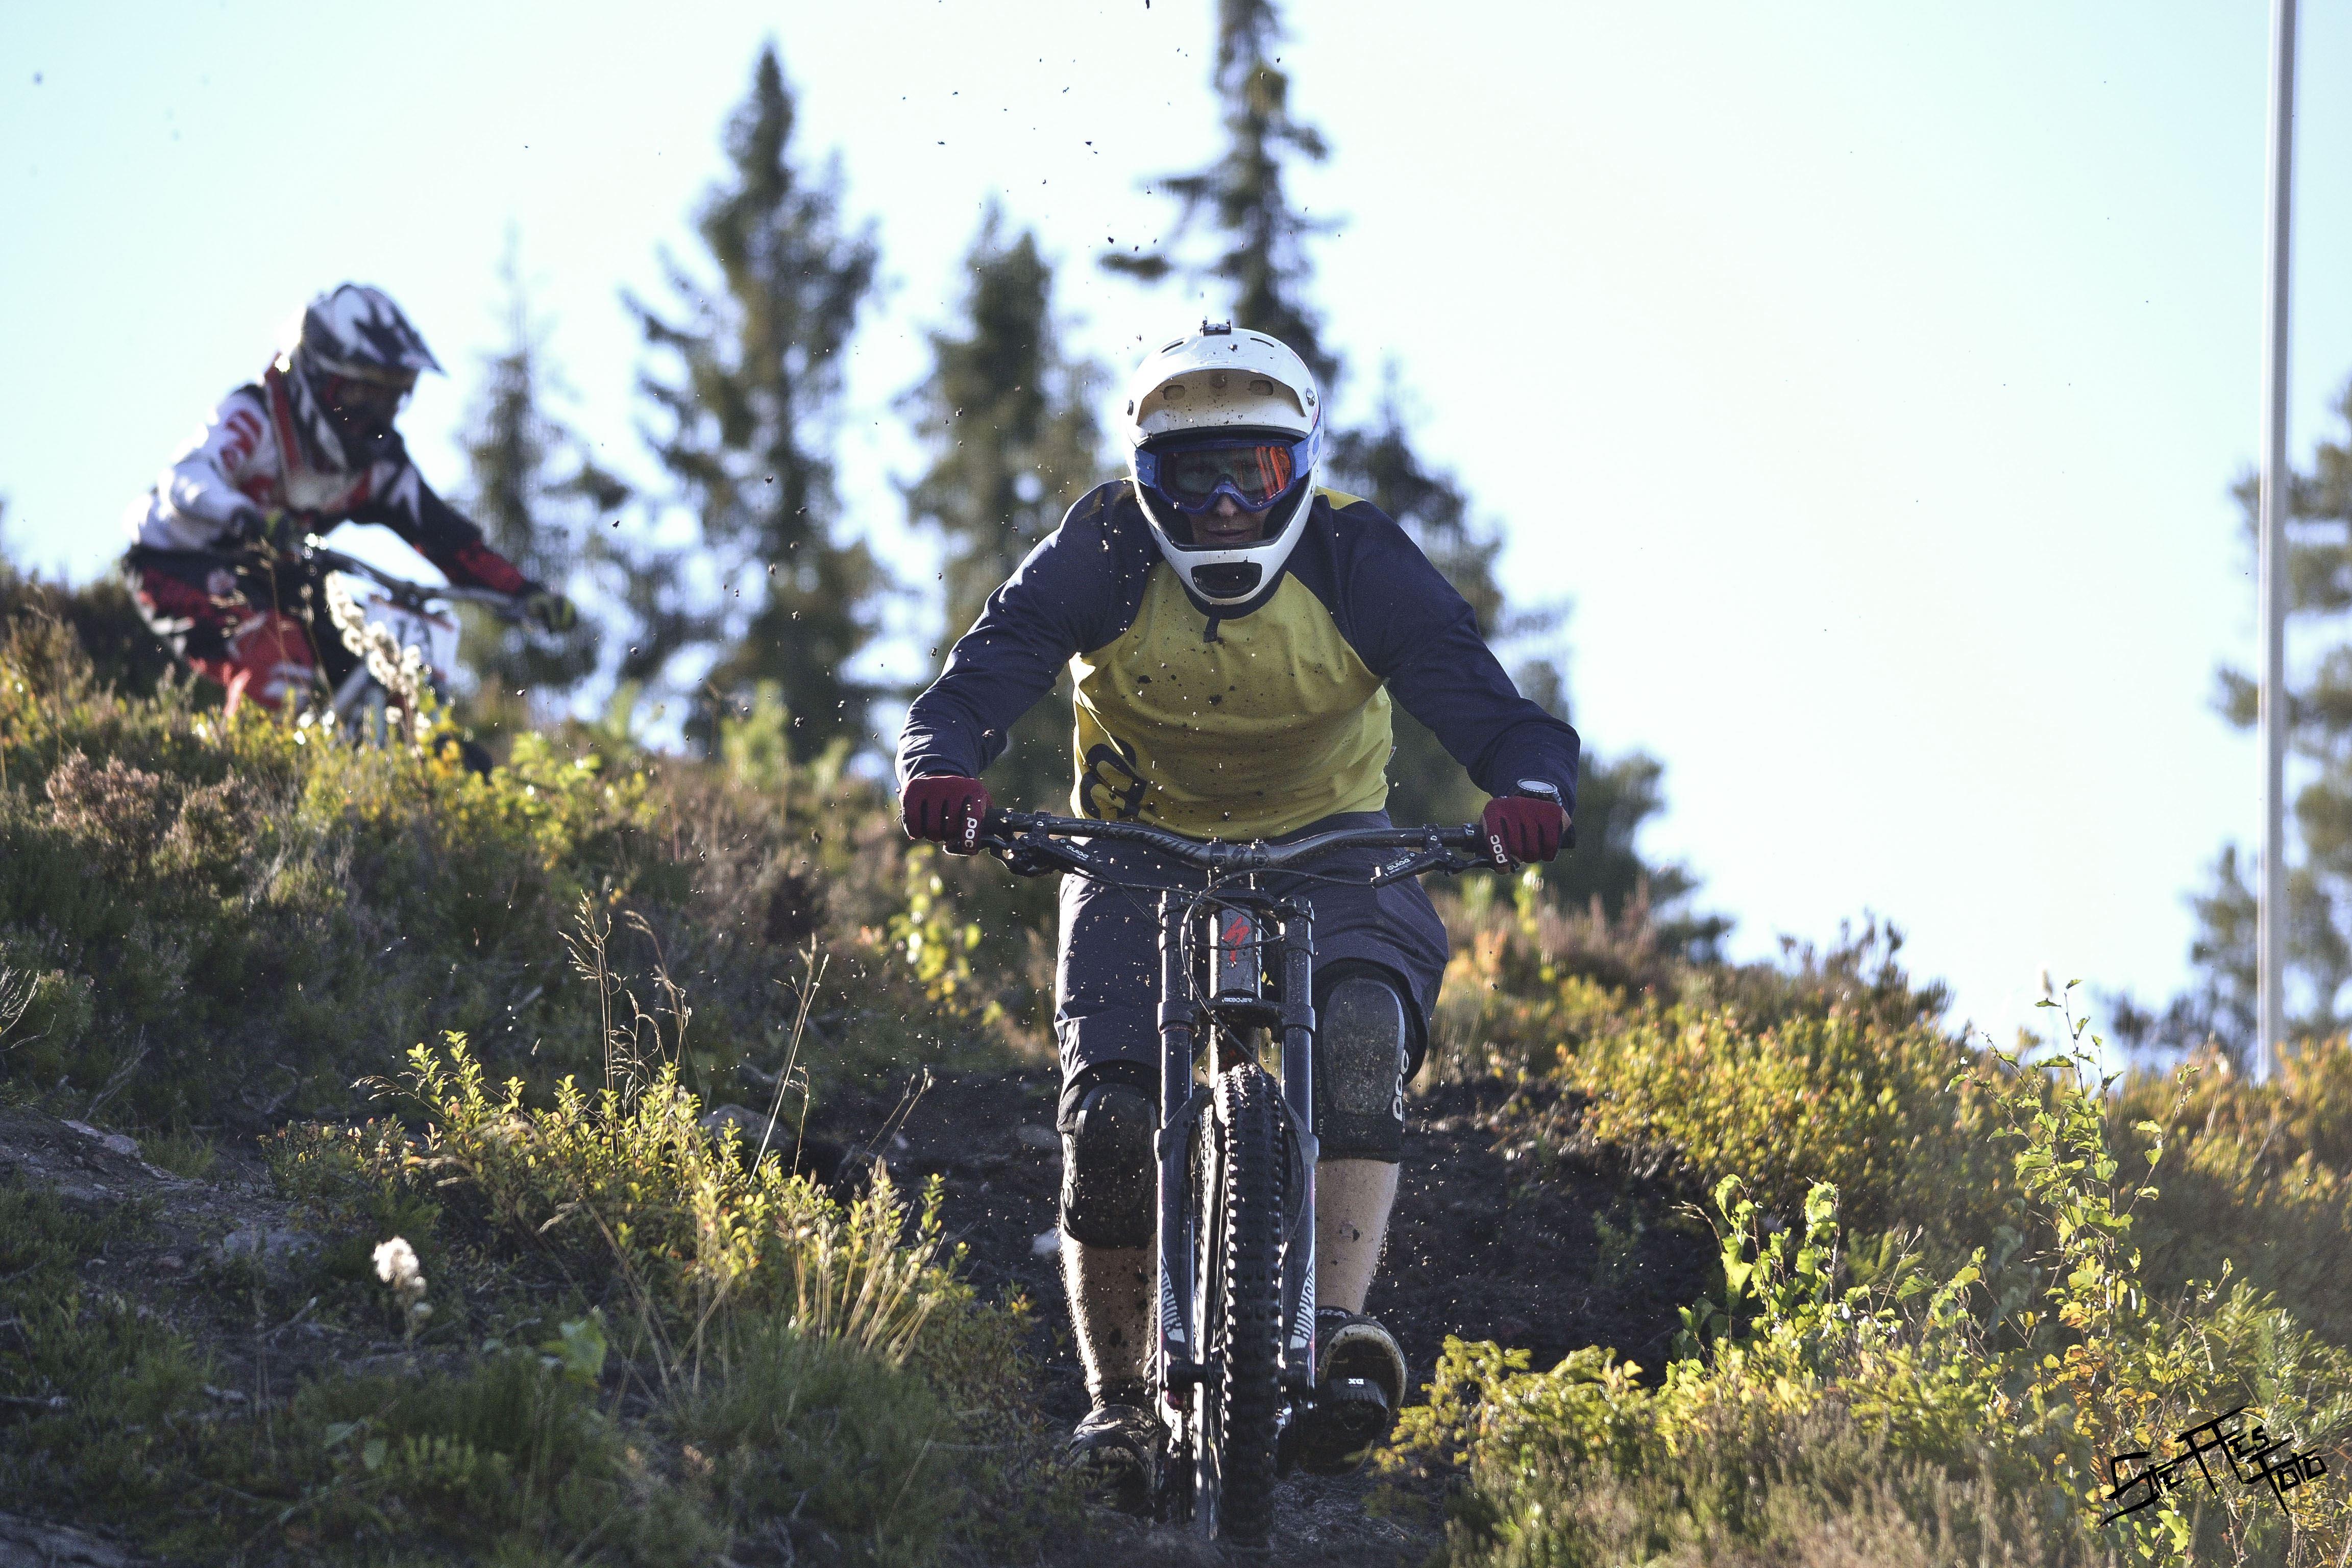 Gesunda Downhill Cup